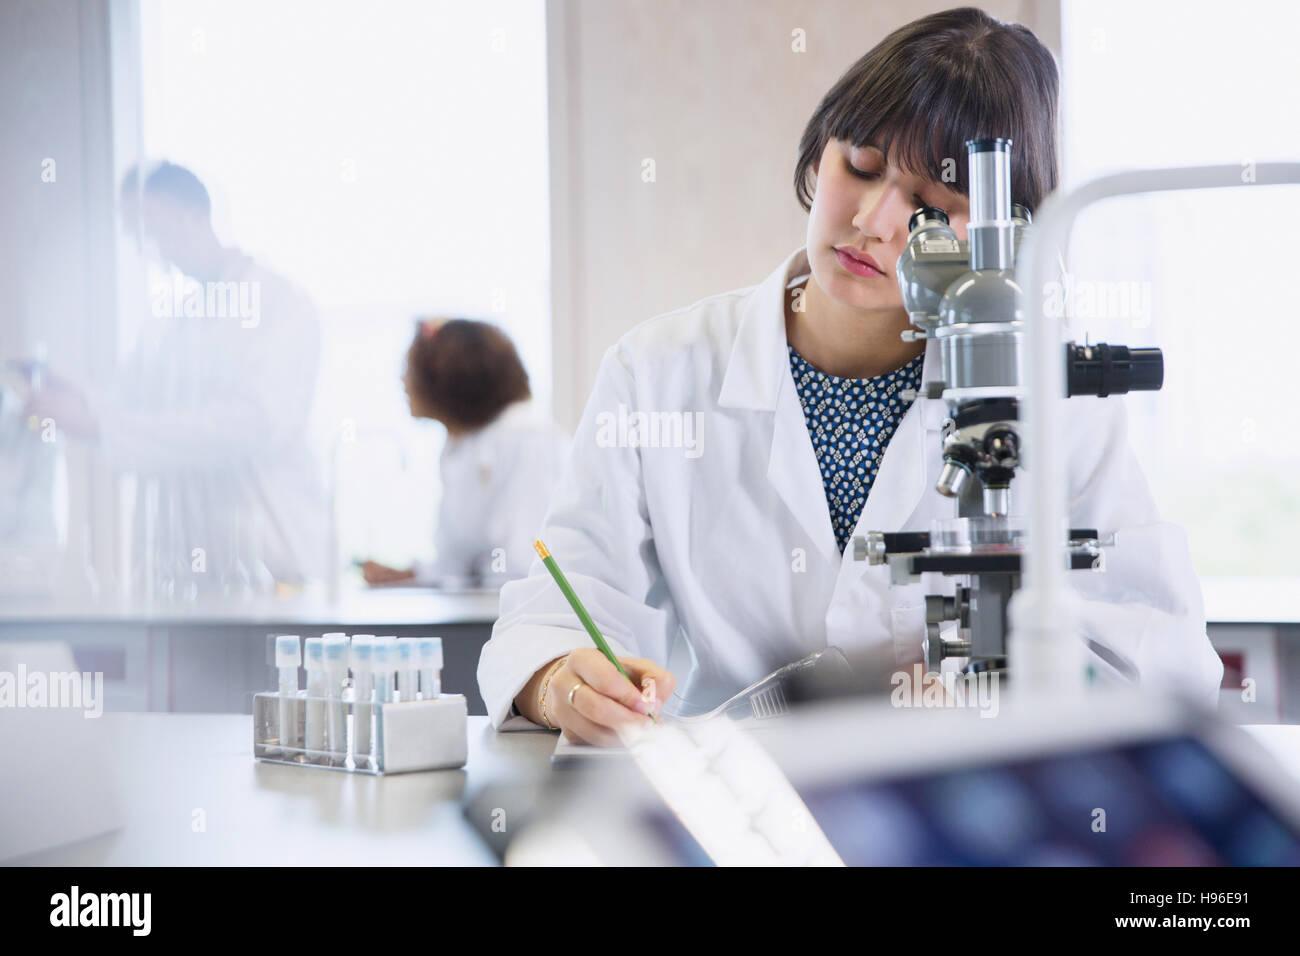 Female college student conducting scientific experiment in science ...